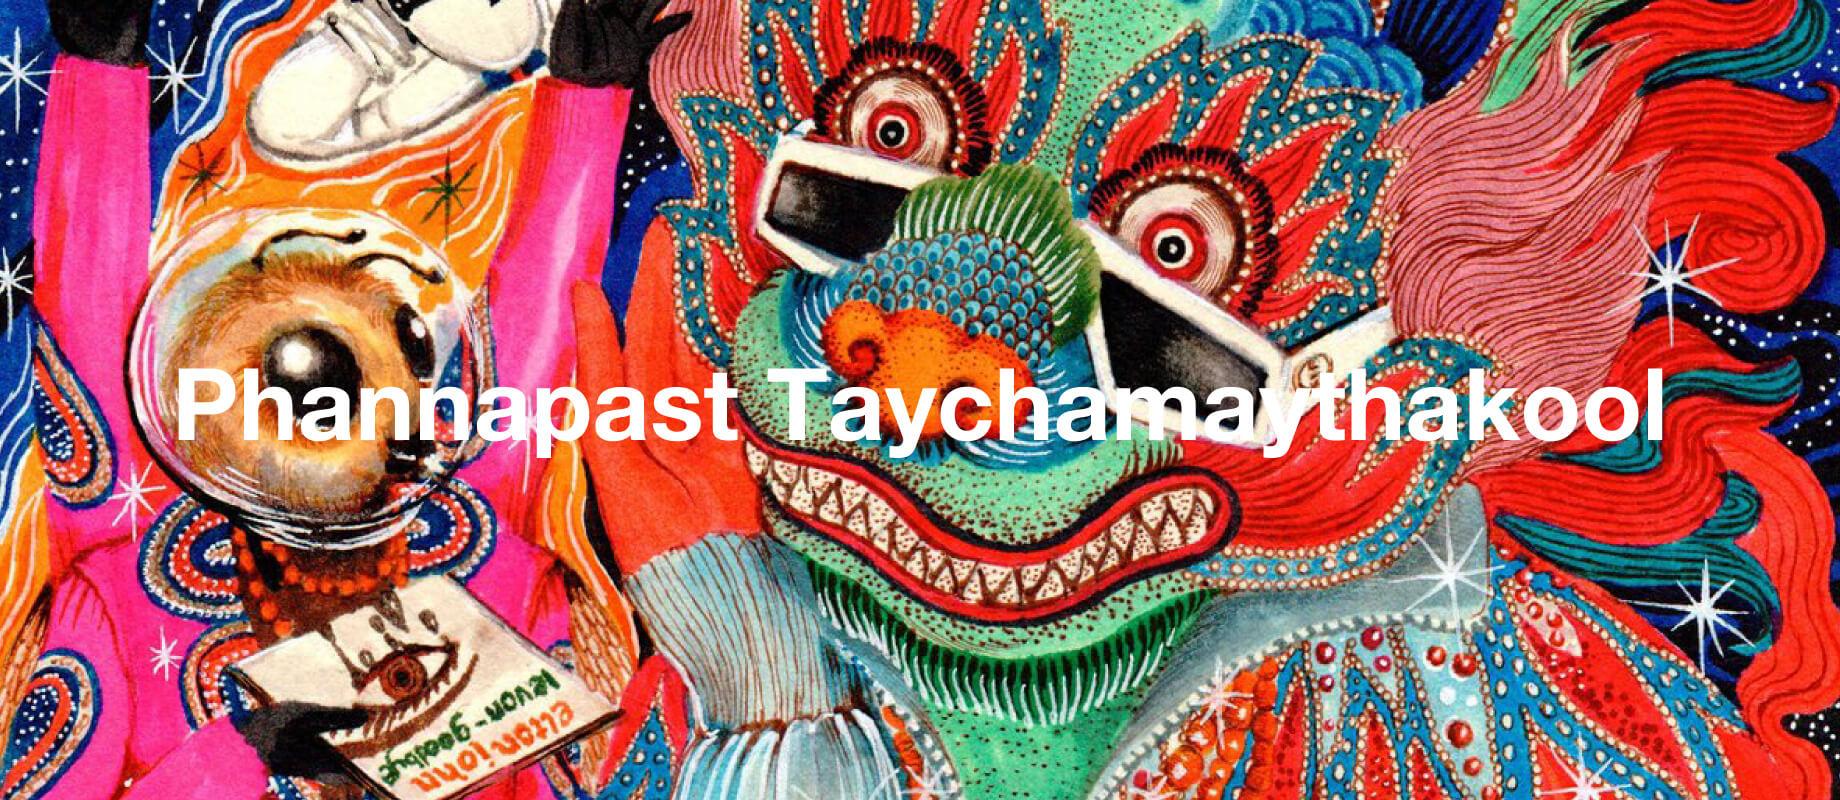 Phannapast Taychamaythakool